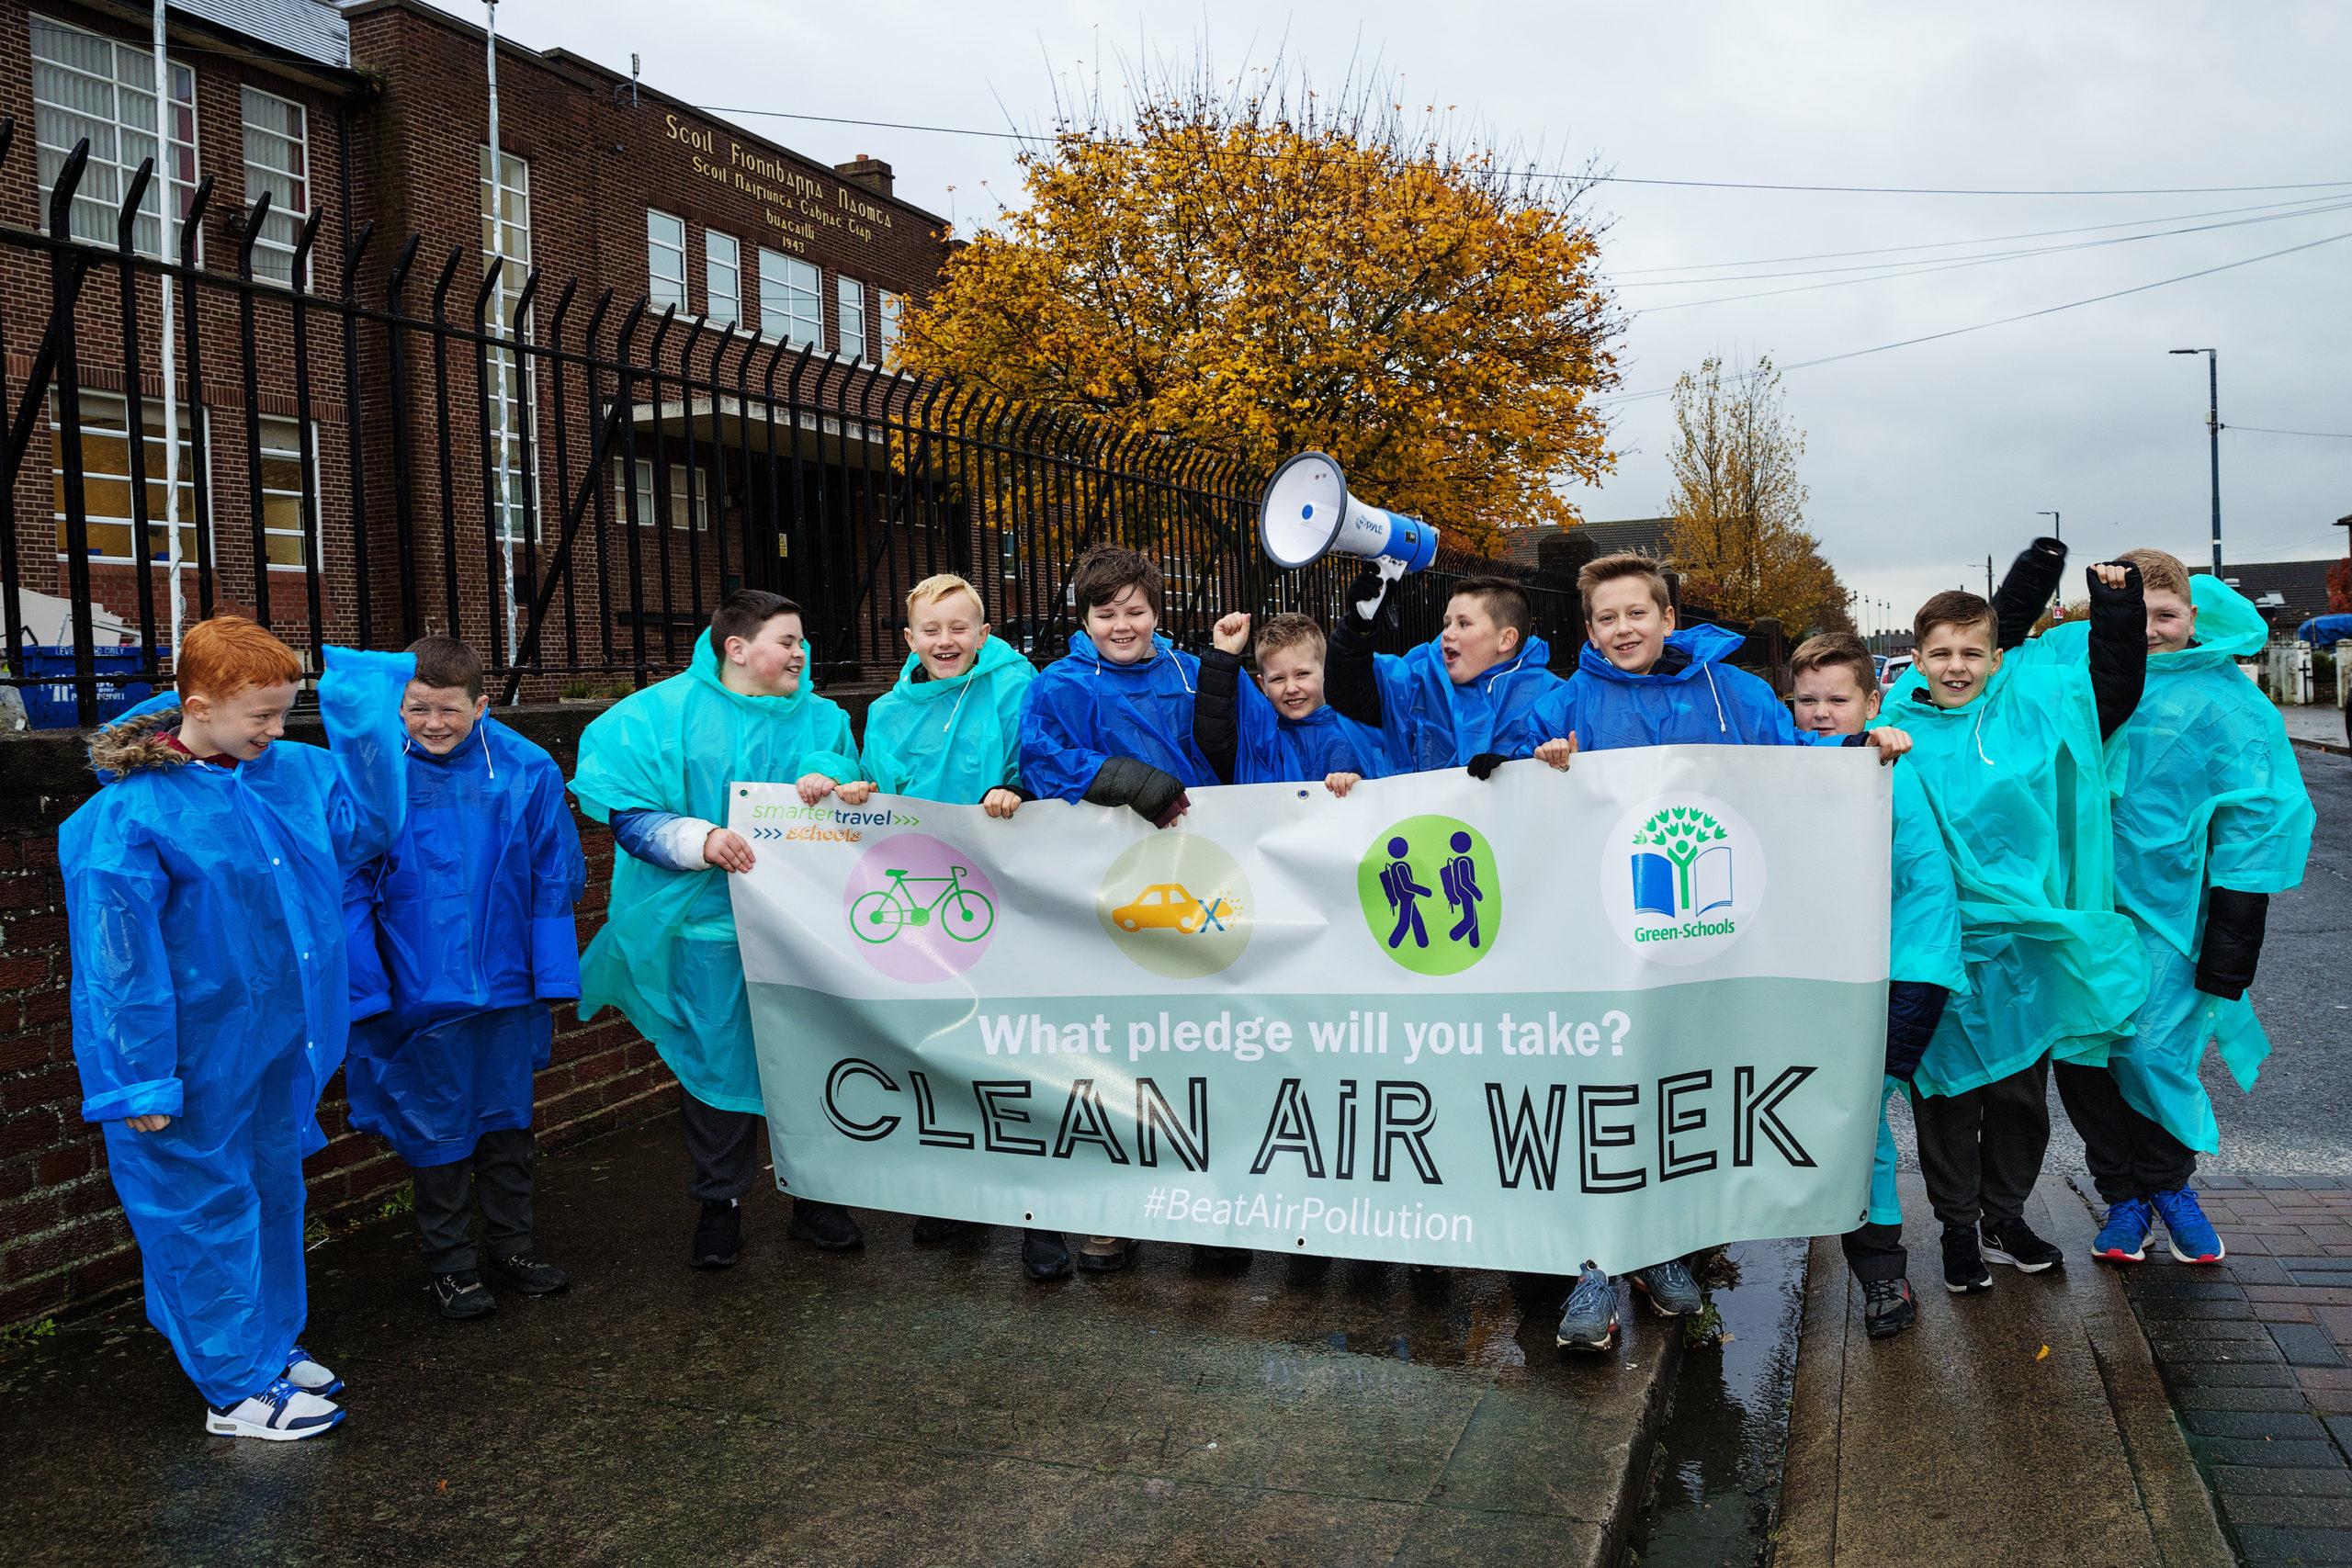 Clean Air Week